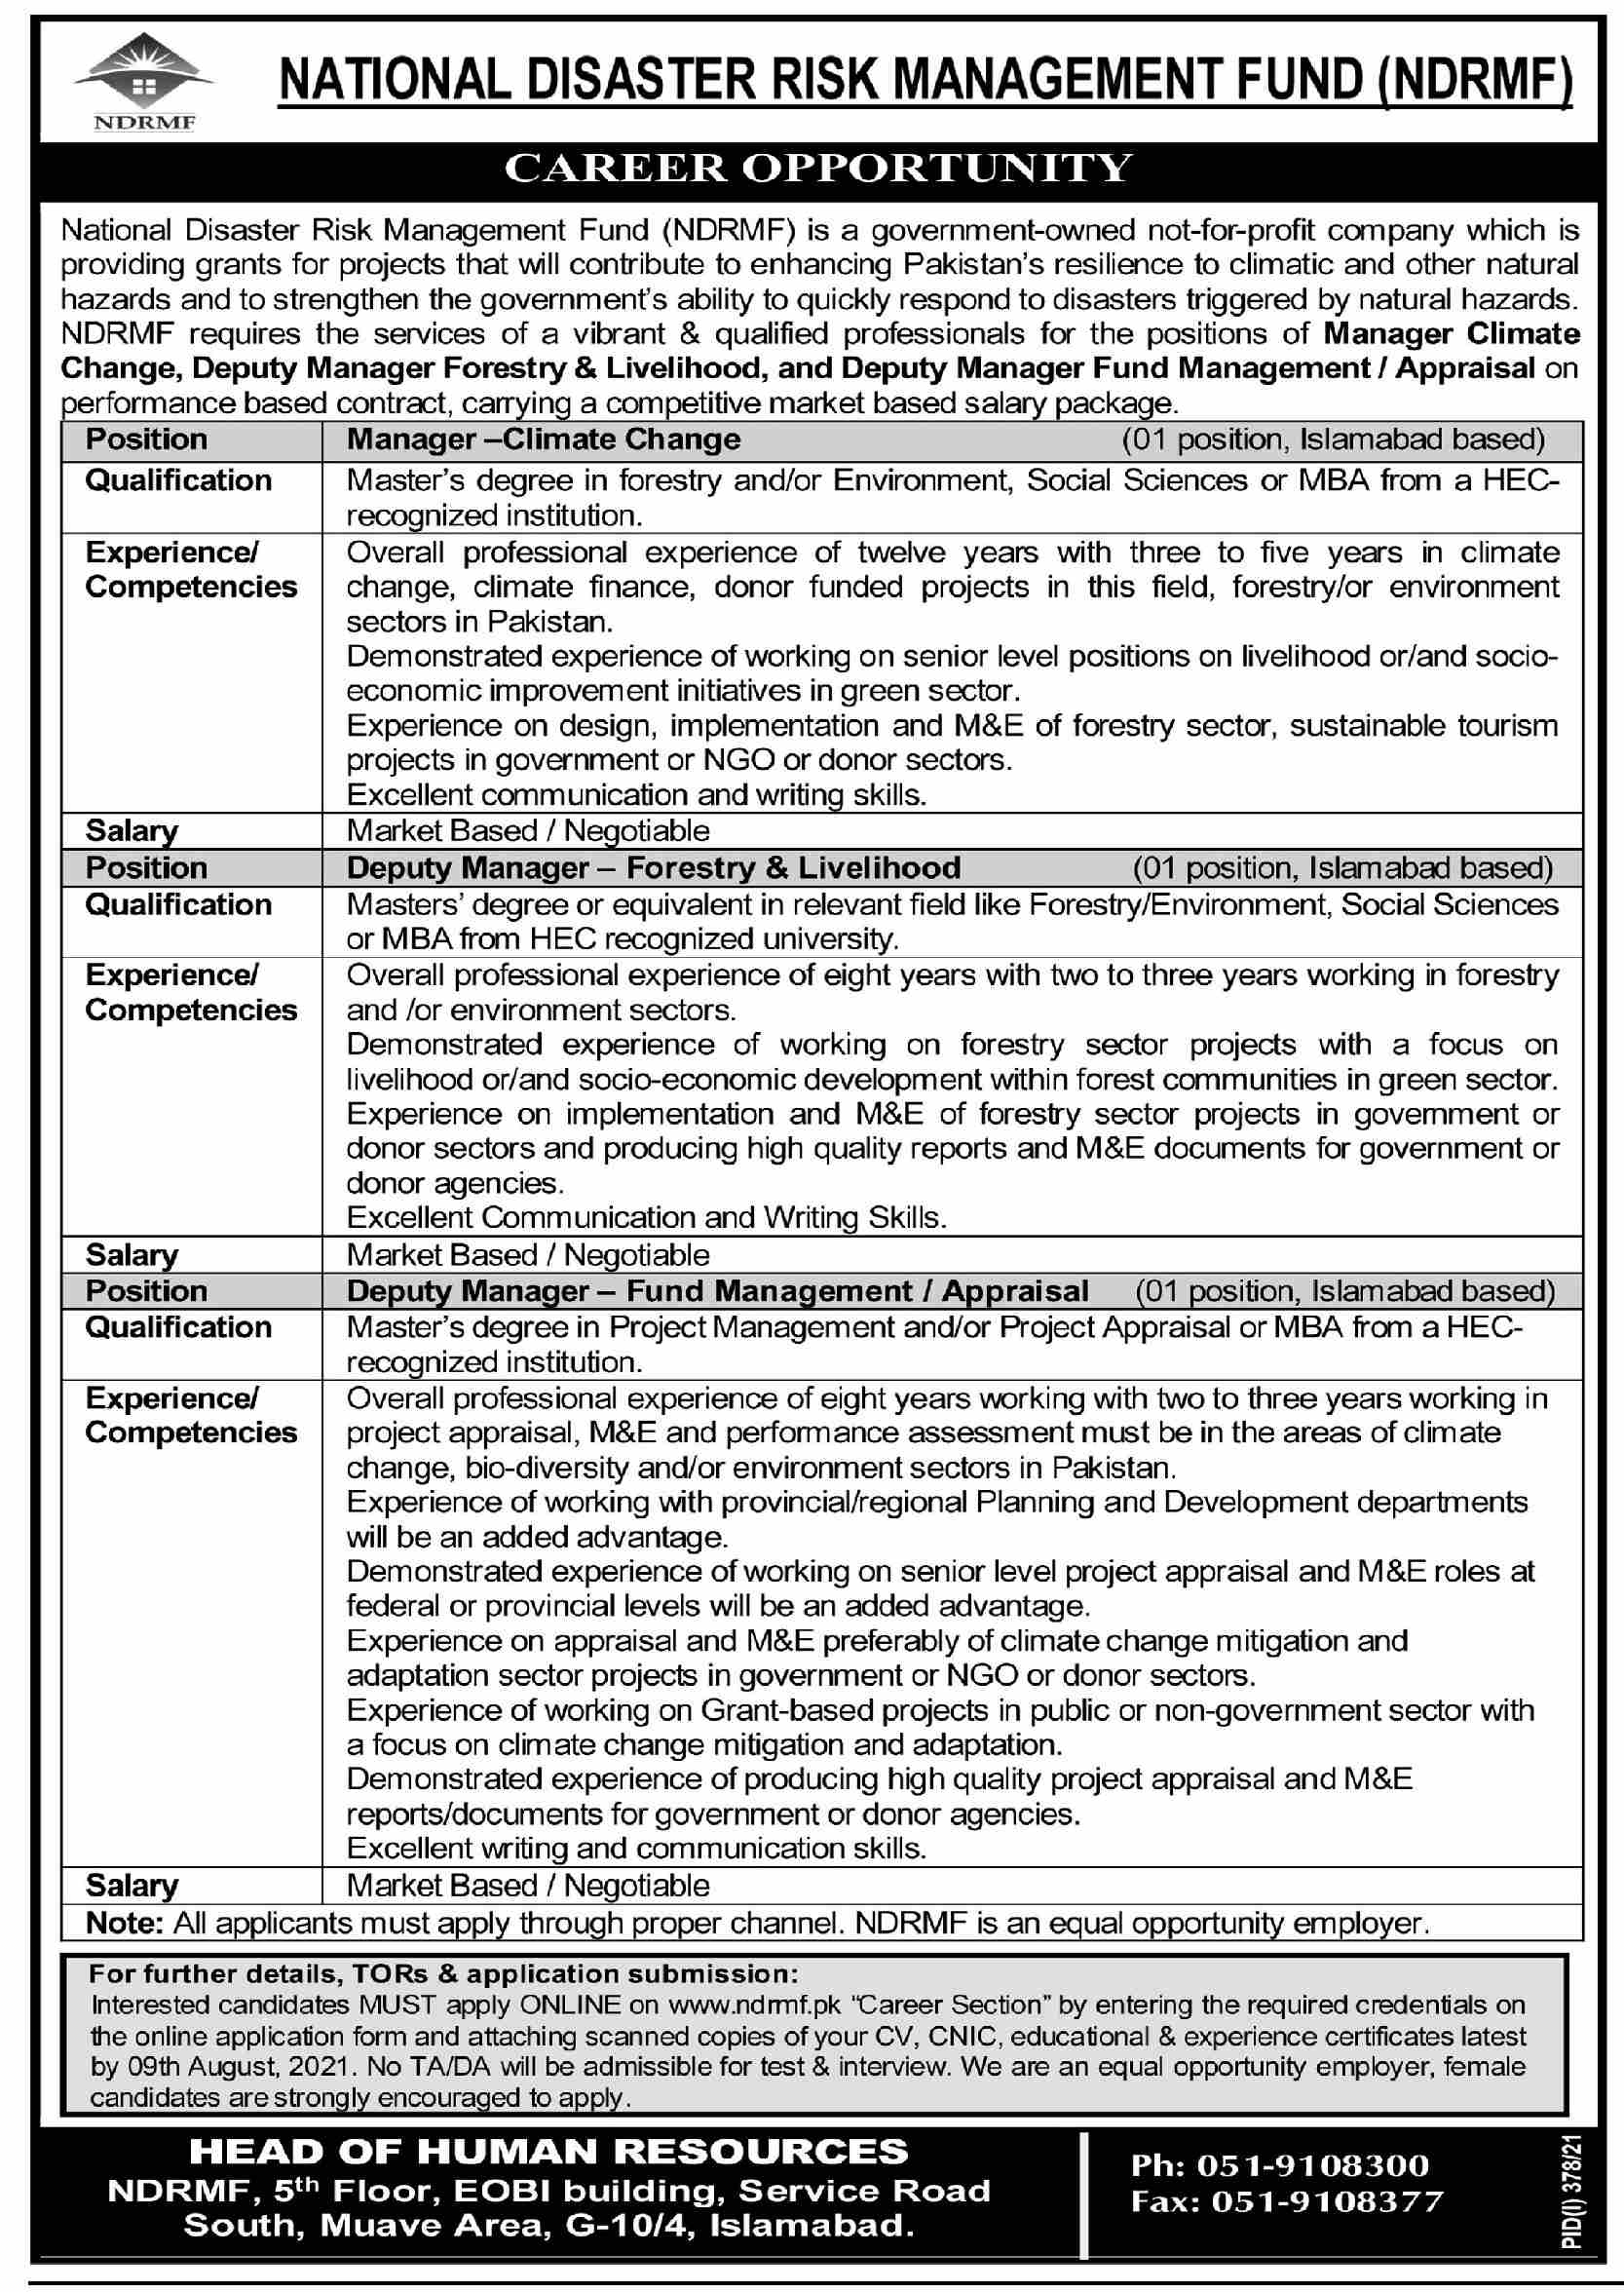 National Disaster Risk Management Fund NDRMF Jobs 2021